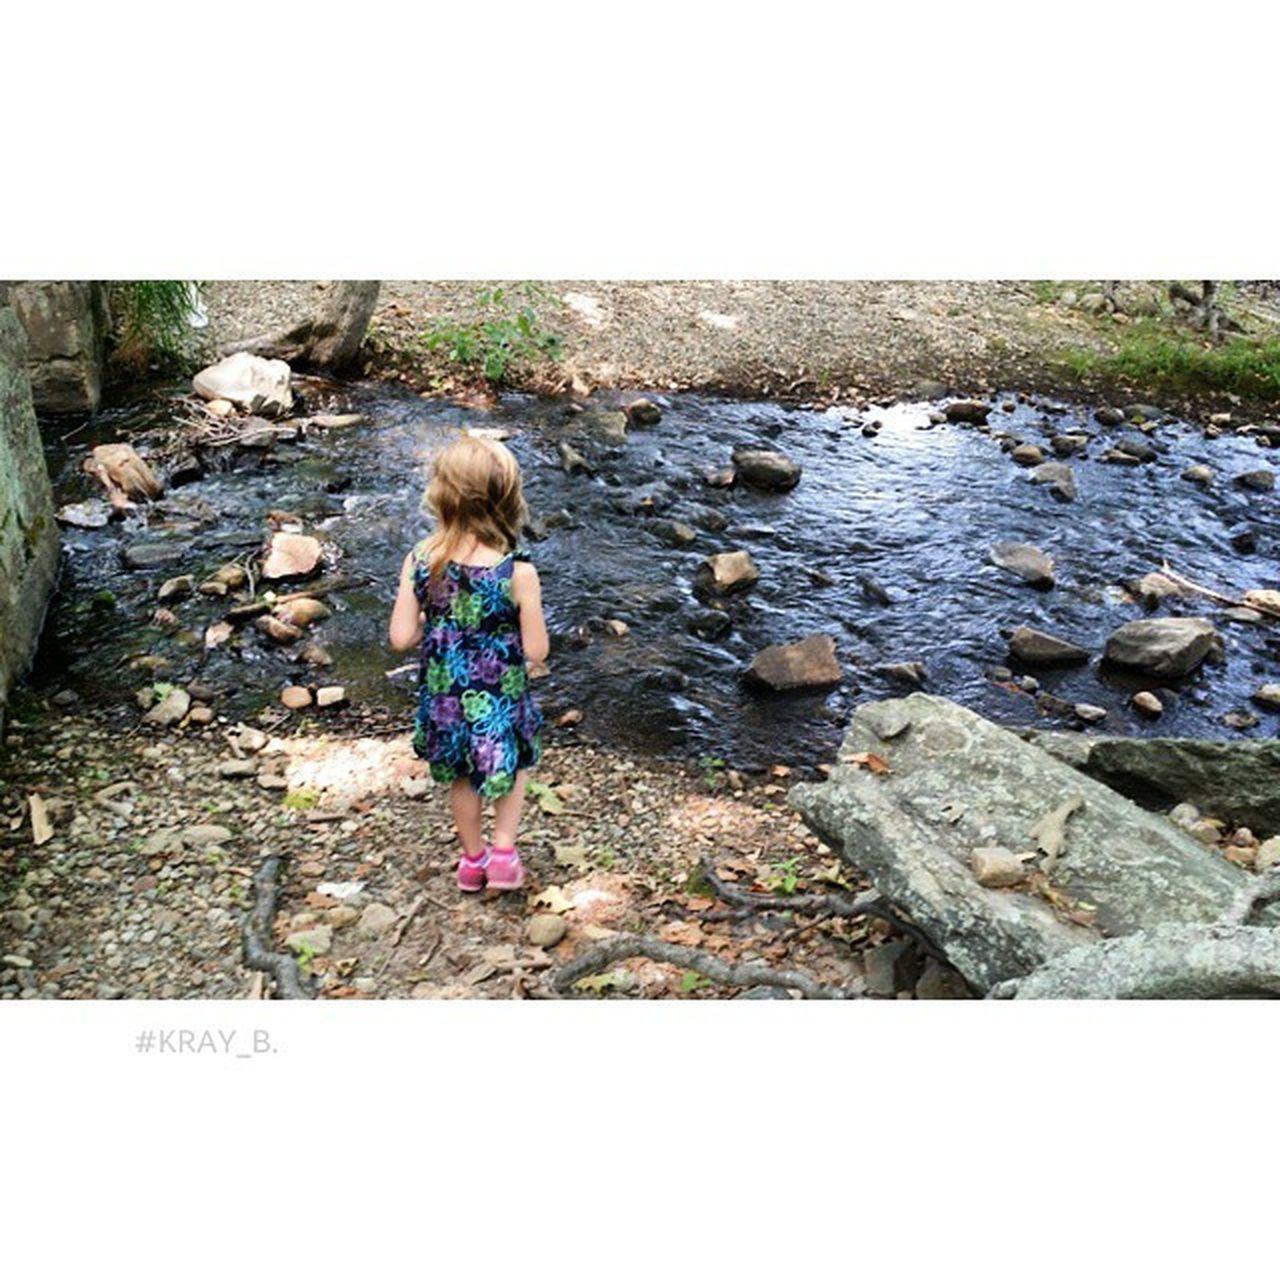 Goldilocks. Instacute Daughter Daddyslittlegirl Mylittlegirl myprincess instalove instapic instaphoto picoftheday photooftheday nature woods bikepath